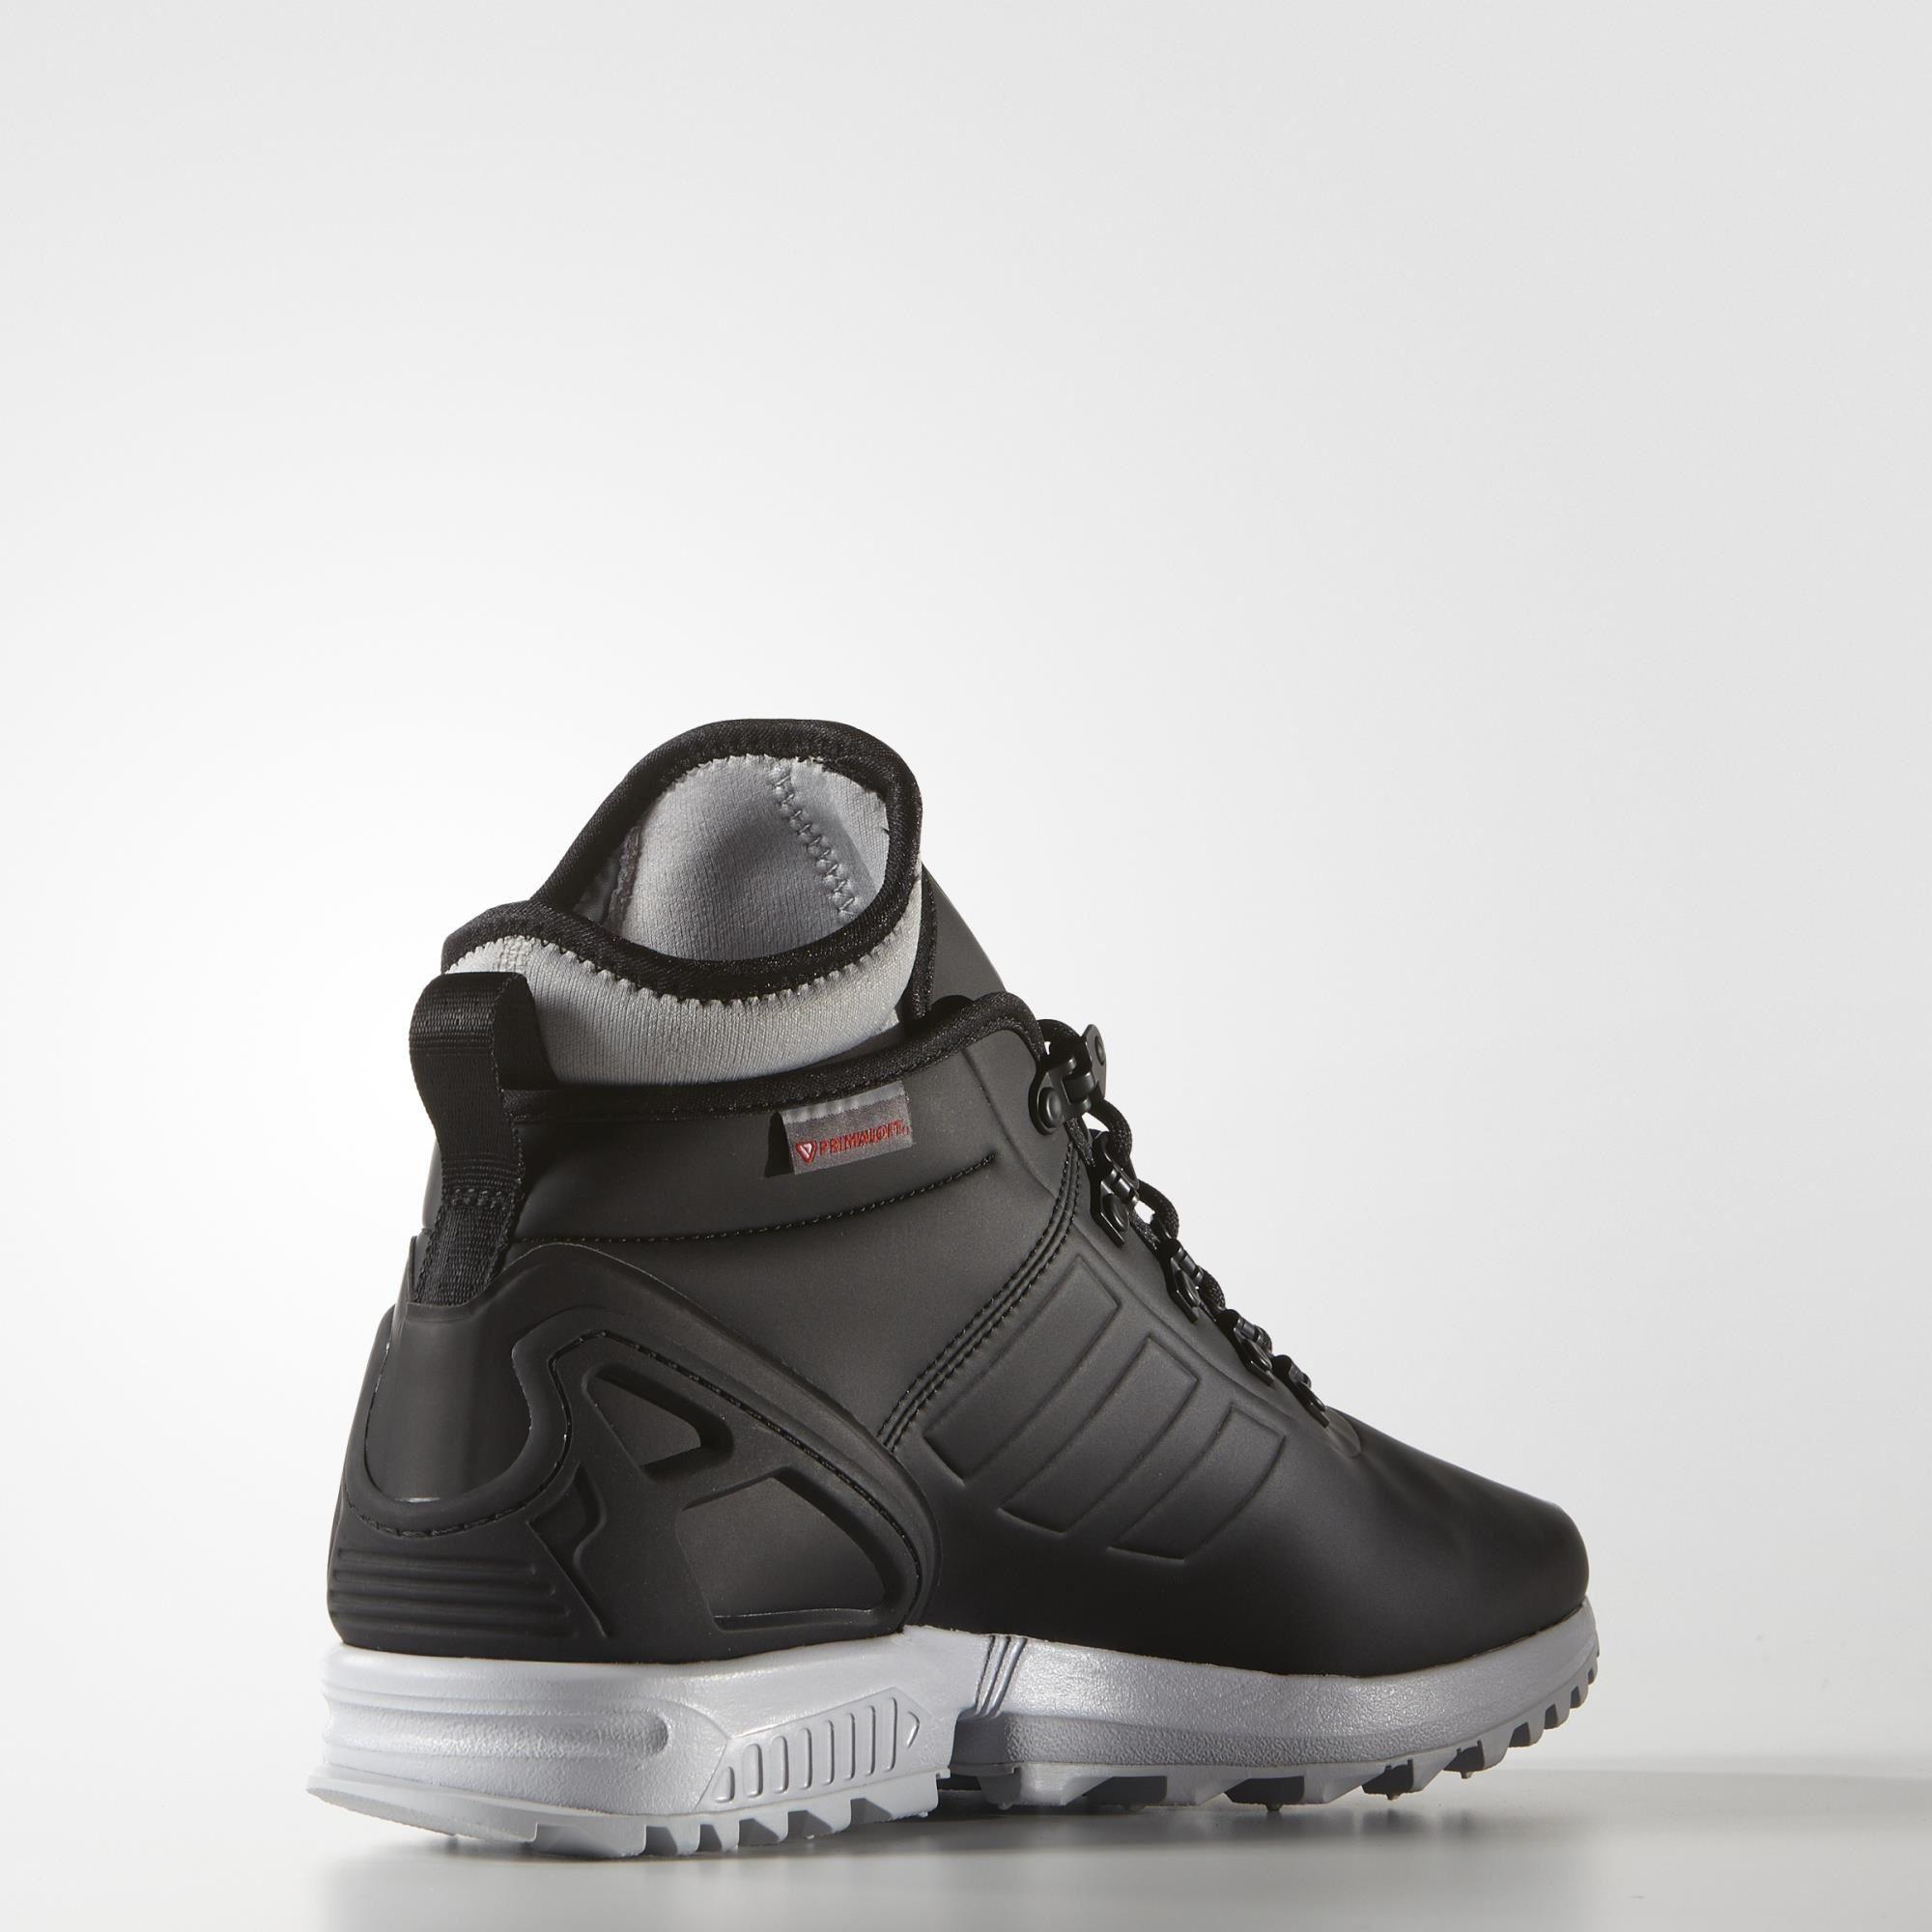 adidas Men's ZX Flux Winter Shoes Black | adidas Canada